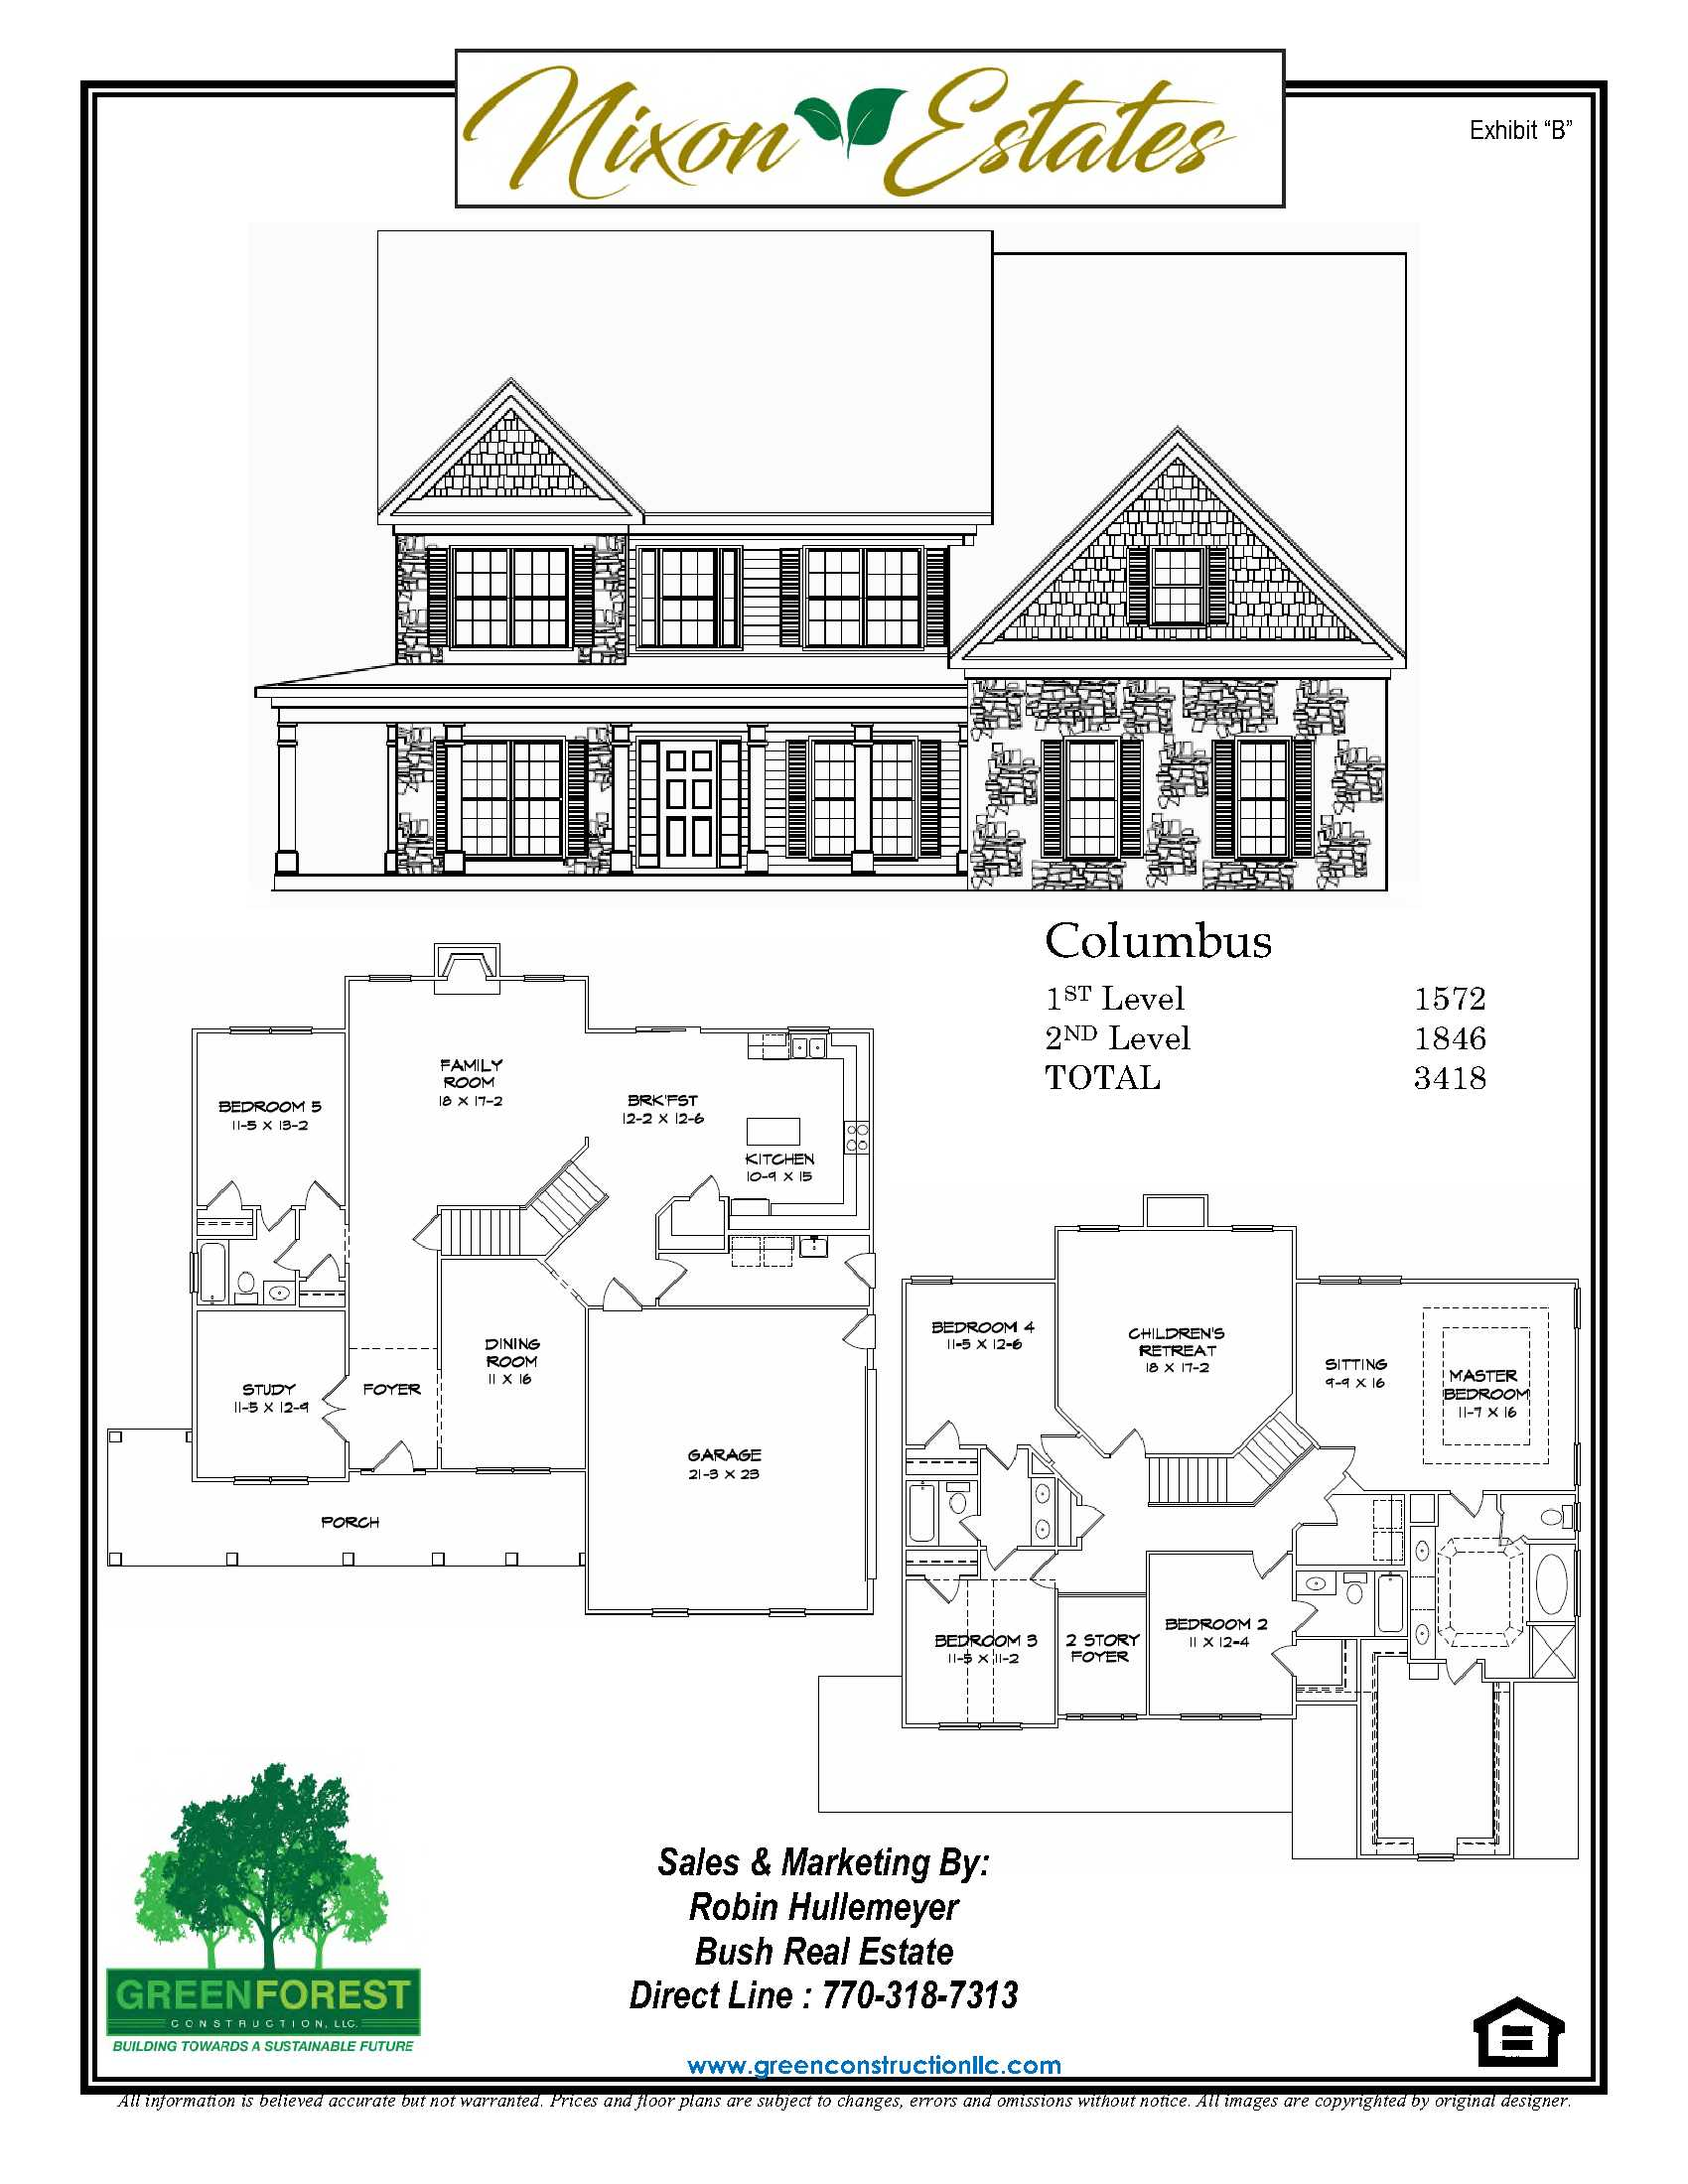 03.13.17 - Nixon Estates Full Package_8.jpg